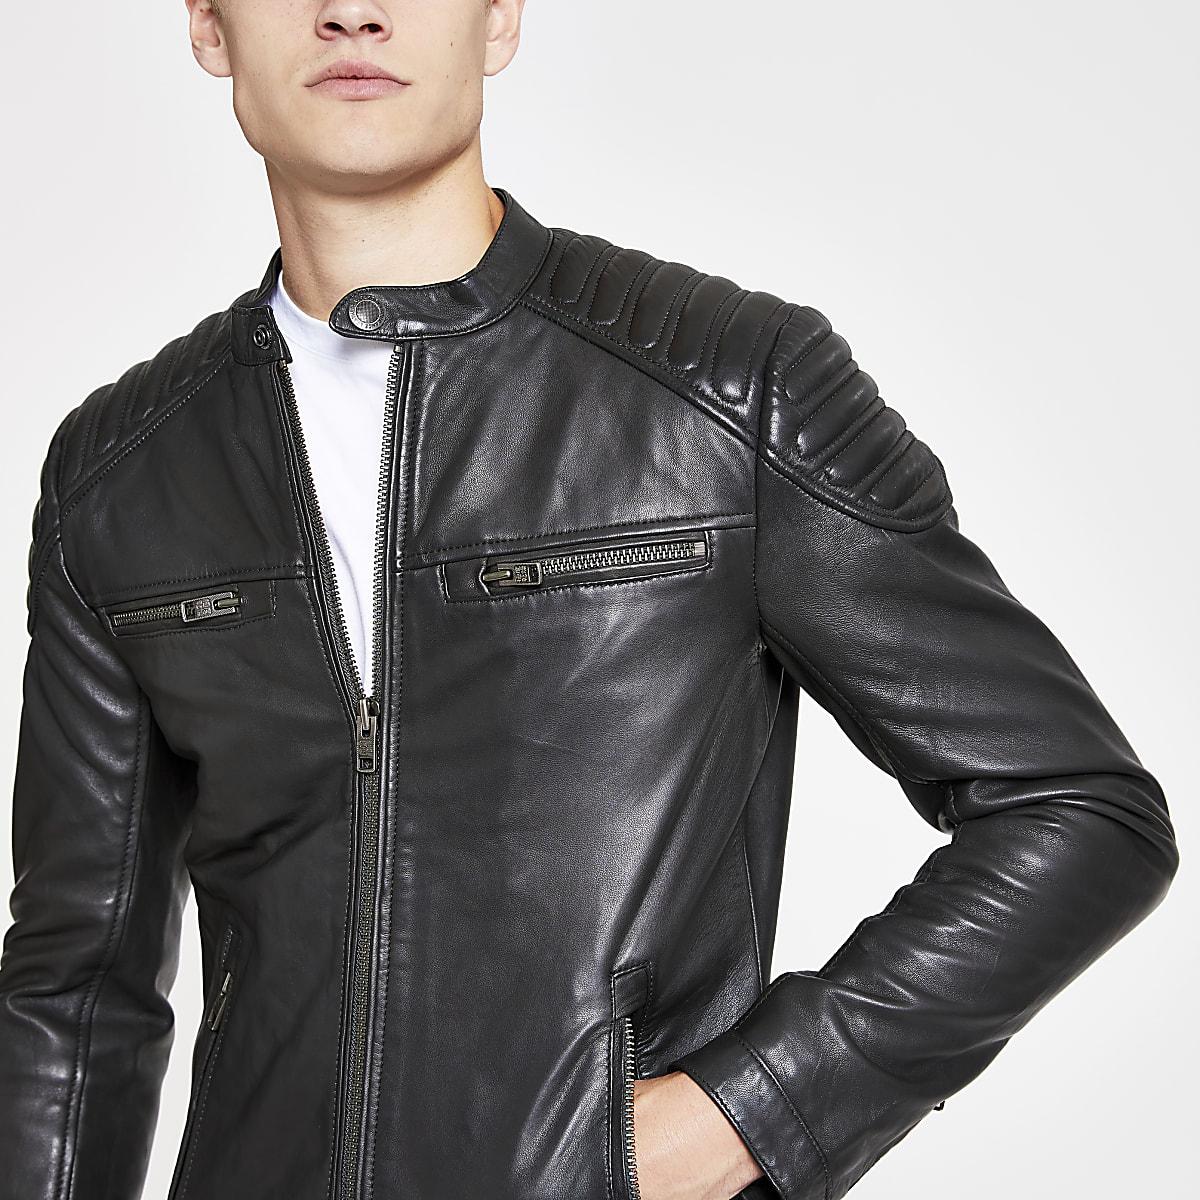 Superdry black leather jacket